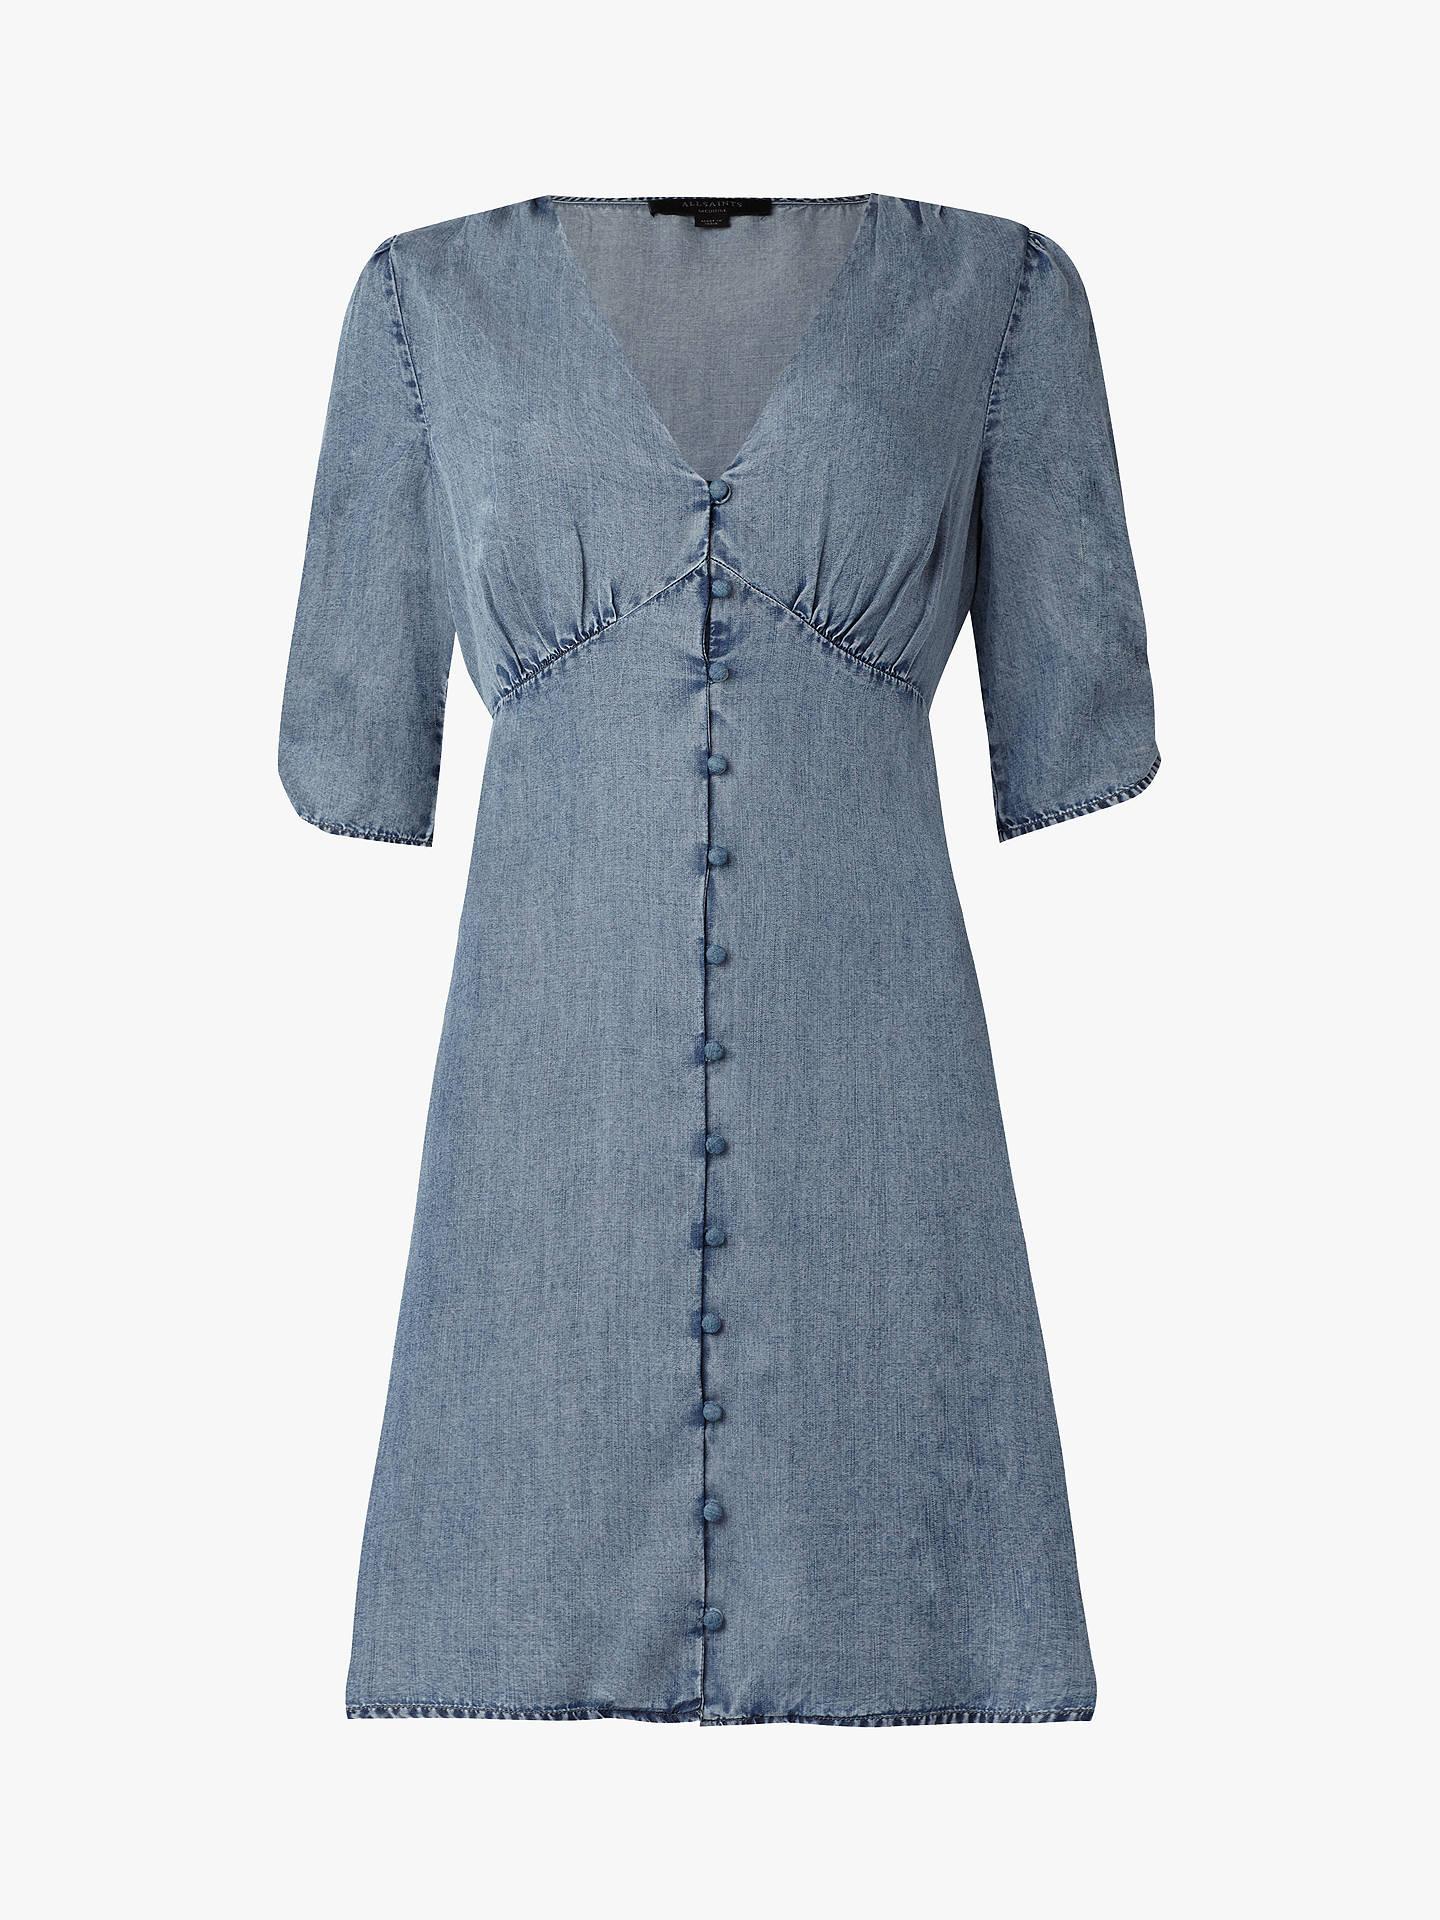 0dc6cf53 AllSaints Kota Dress, Indigo Blue